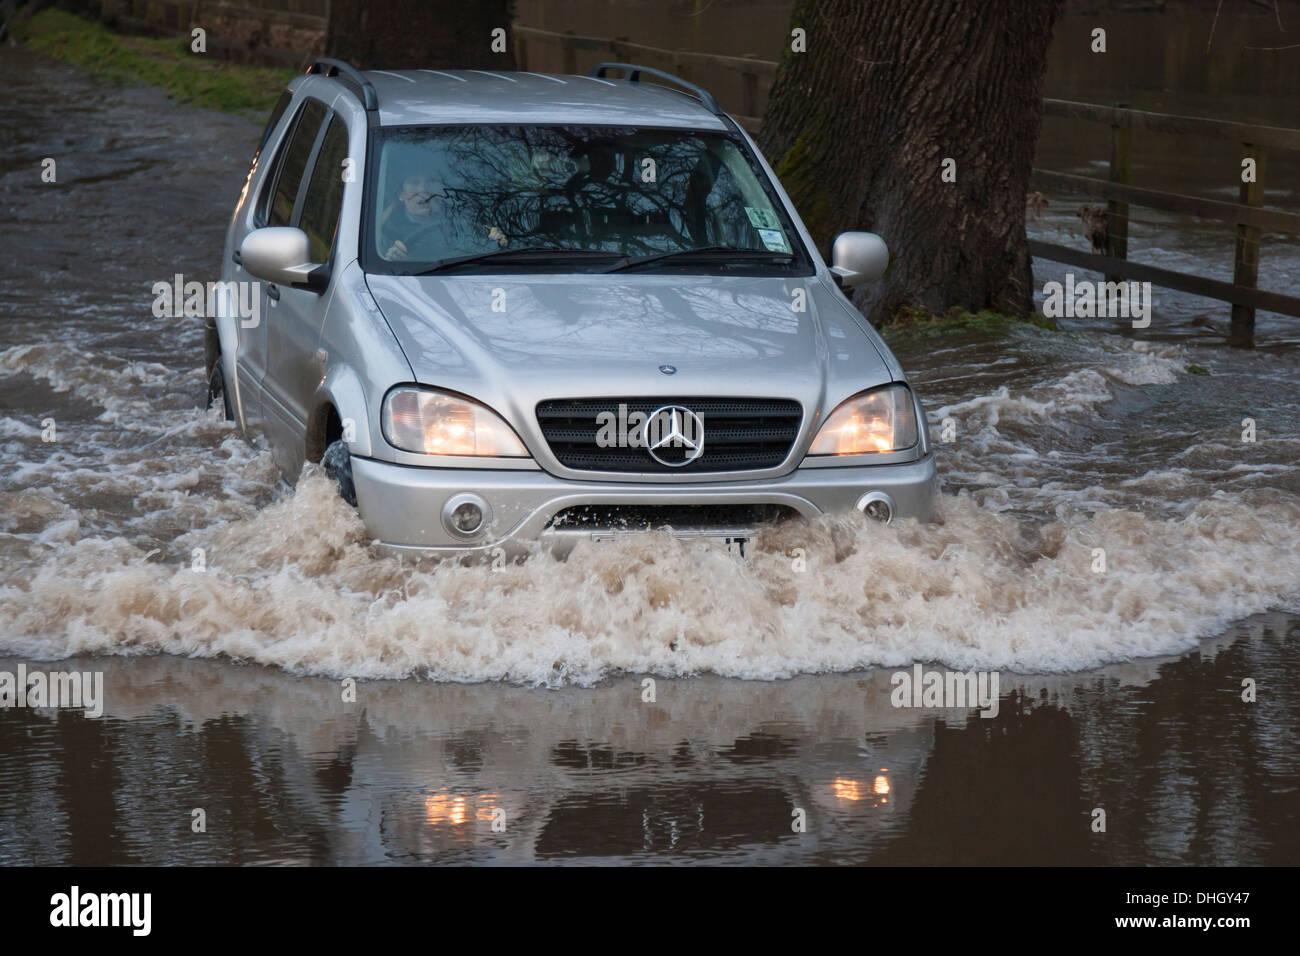 Car driving through flood - Stock Image